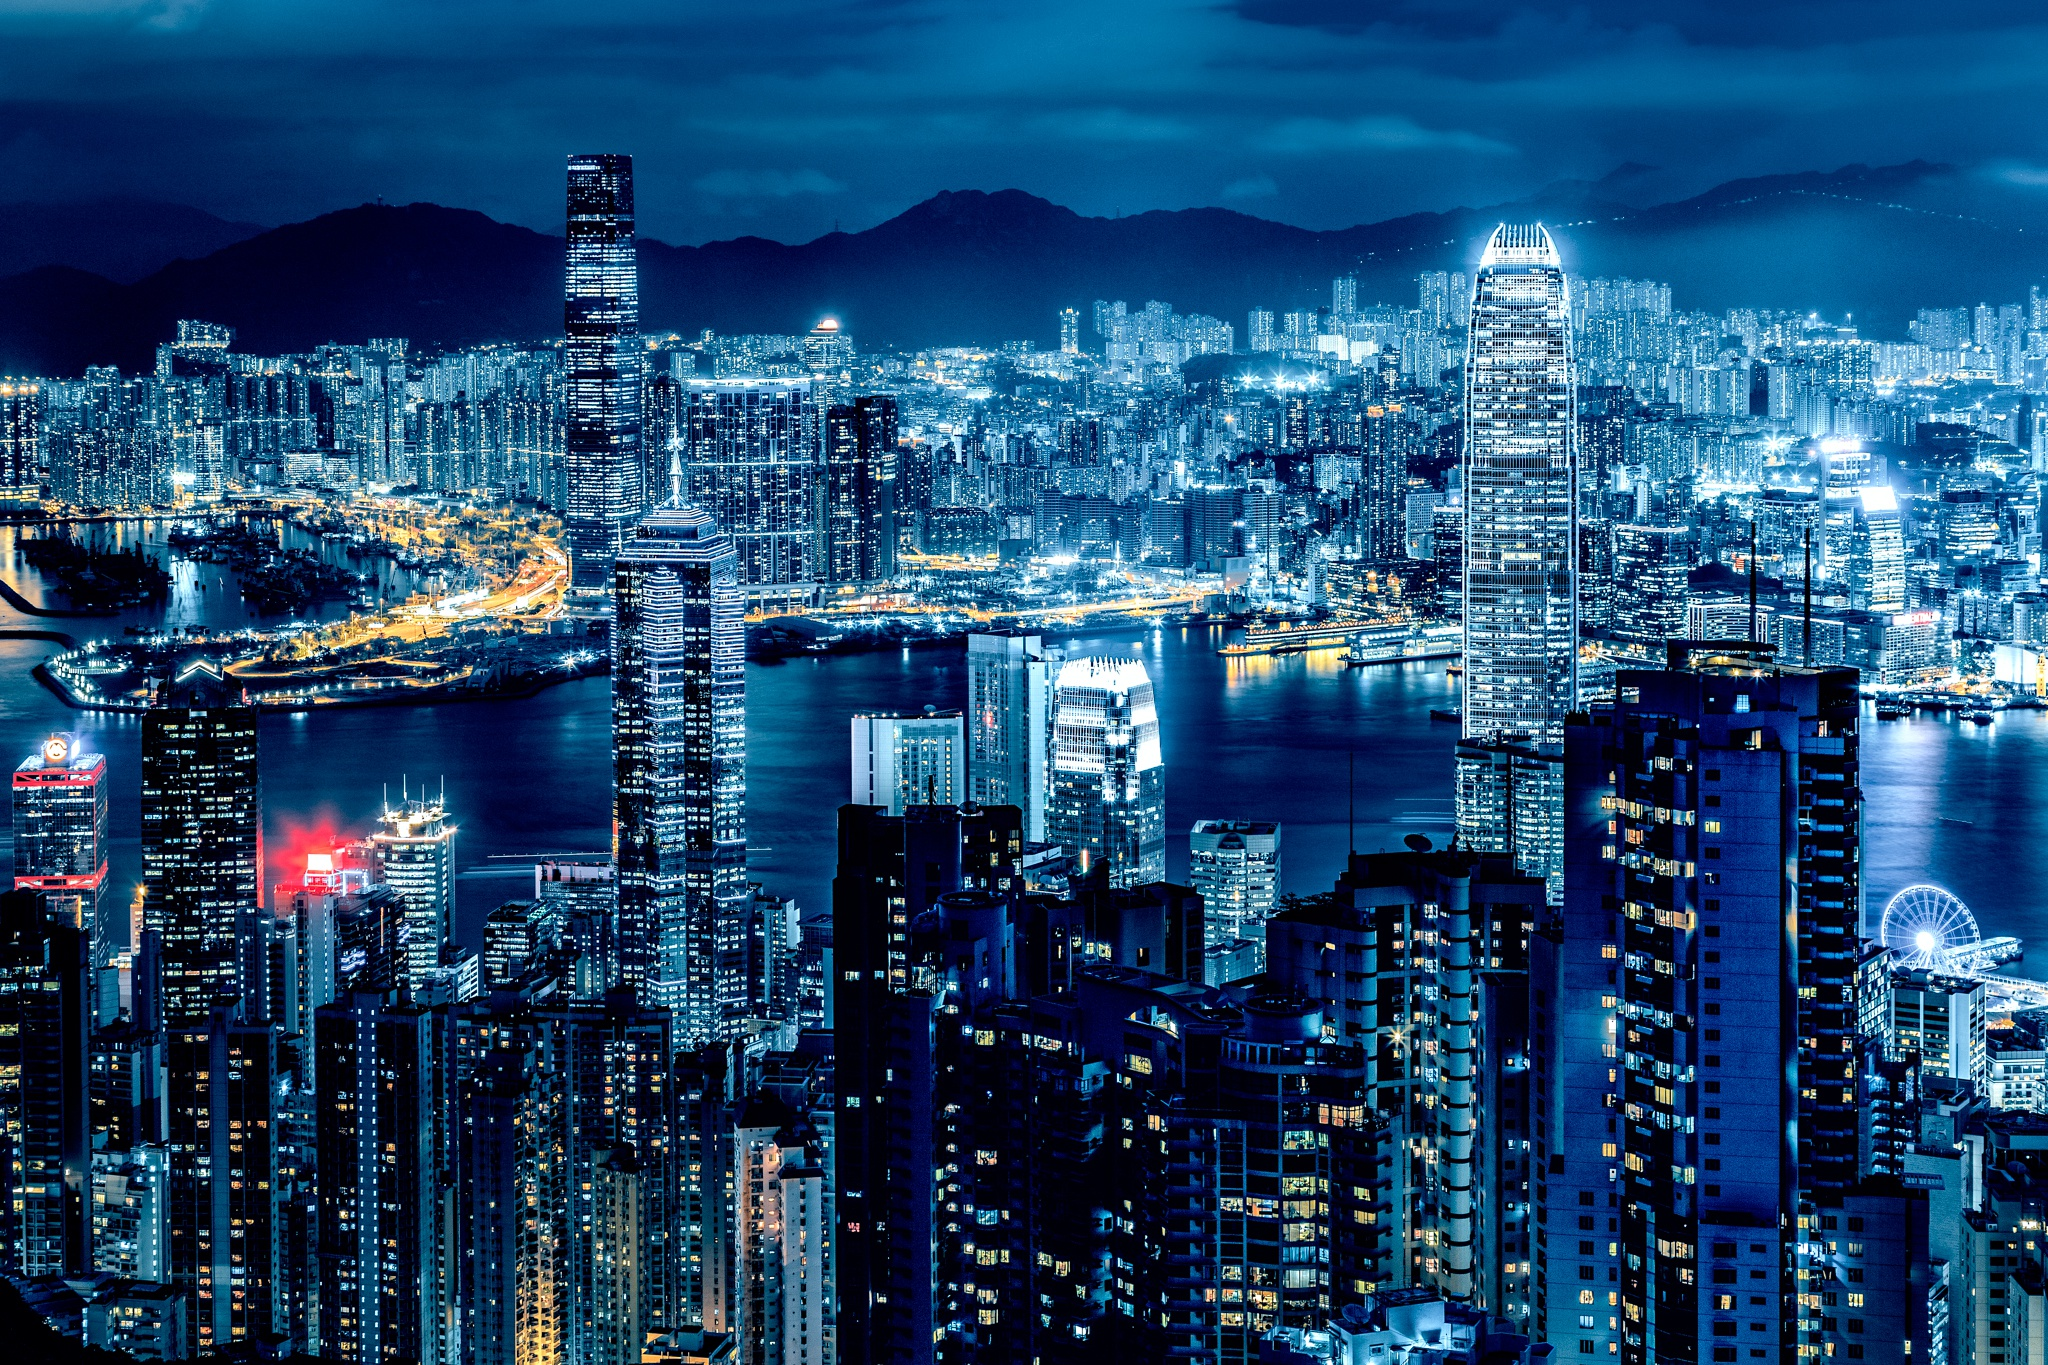 картинки ночного города на телефон площади рядом